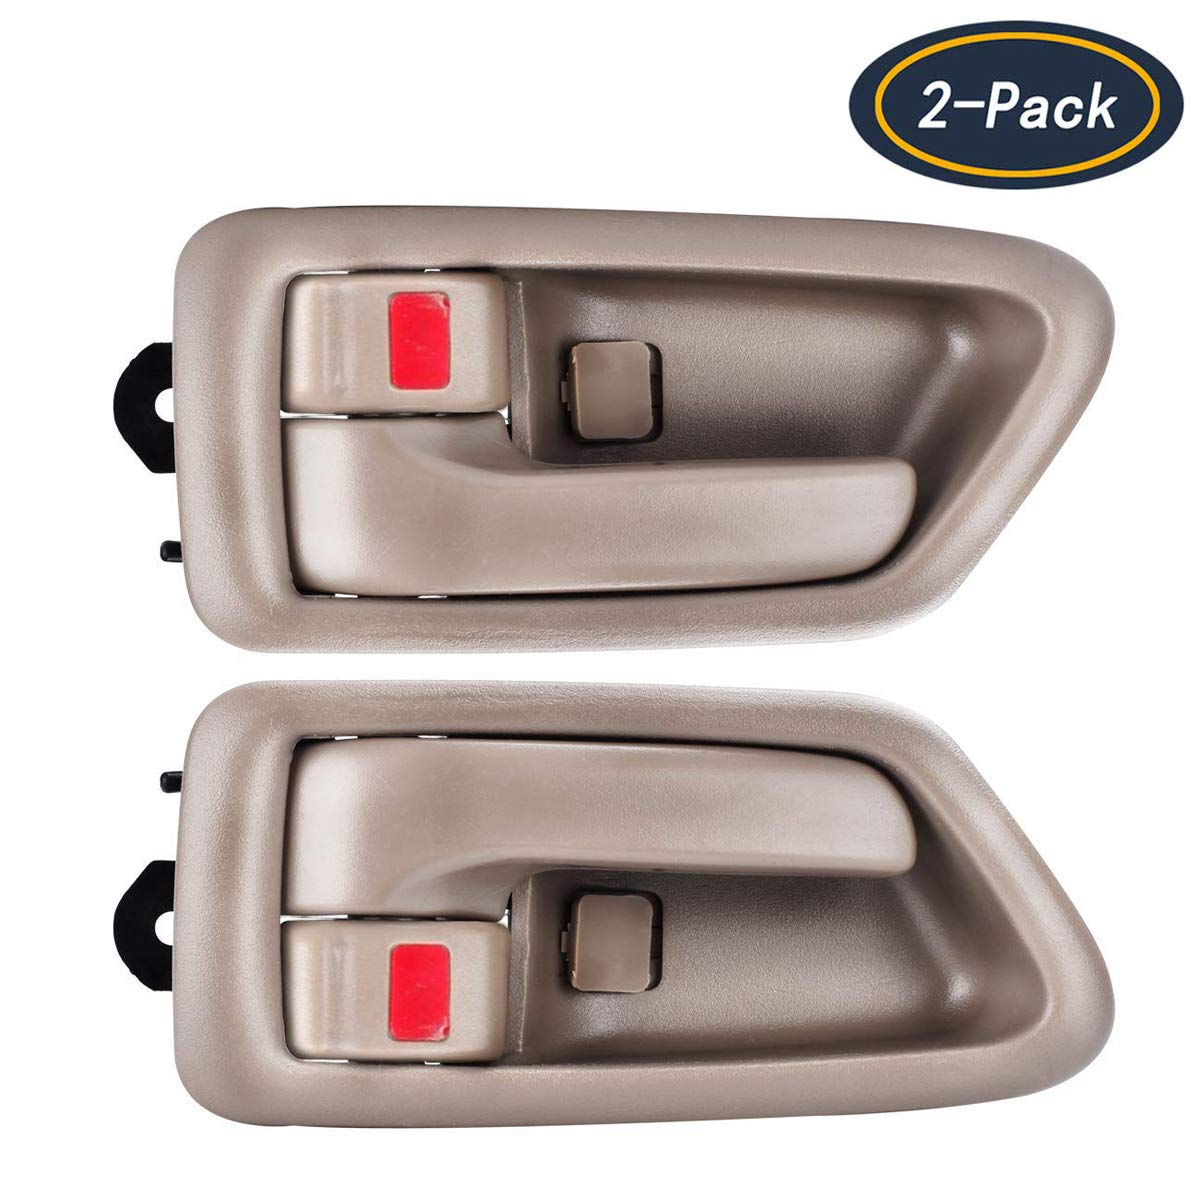 faersi 2Pcs Inside Interior Door Handle Front Rear Driver & Passenger Side for 1997 1998 1999 2000 2001 Toyota Camry Beige/Tan